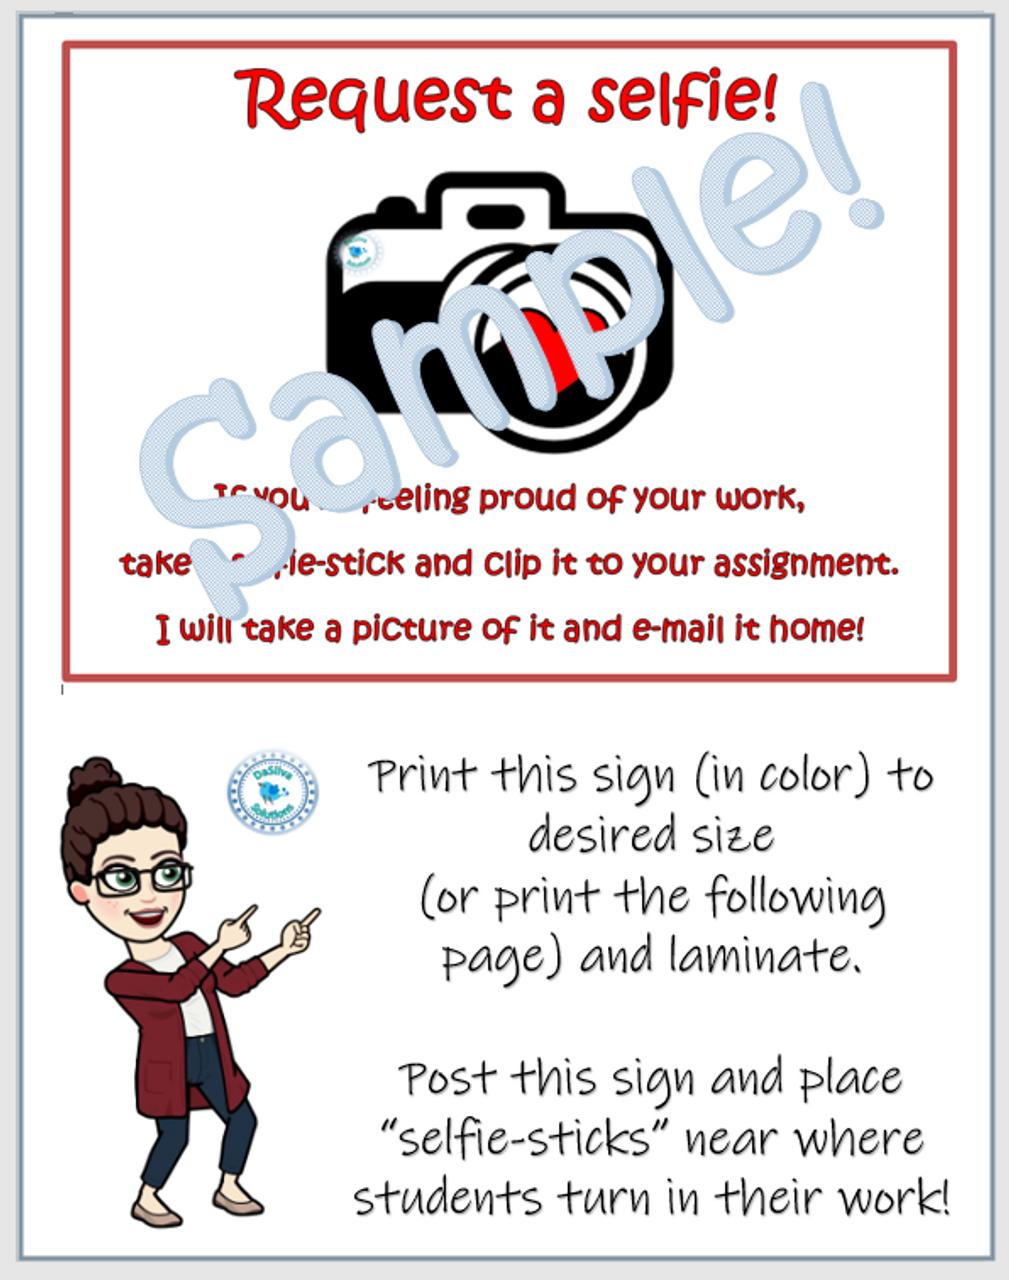 """Request a selfie"" student work positive reinforcement tool"